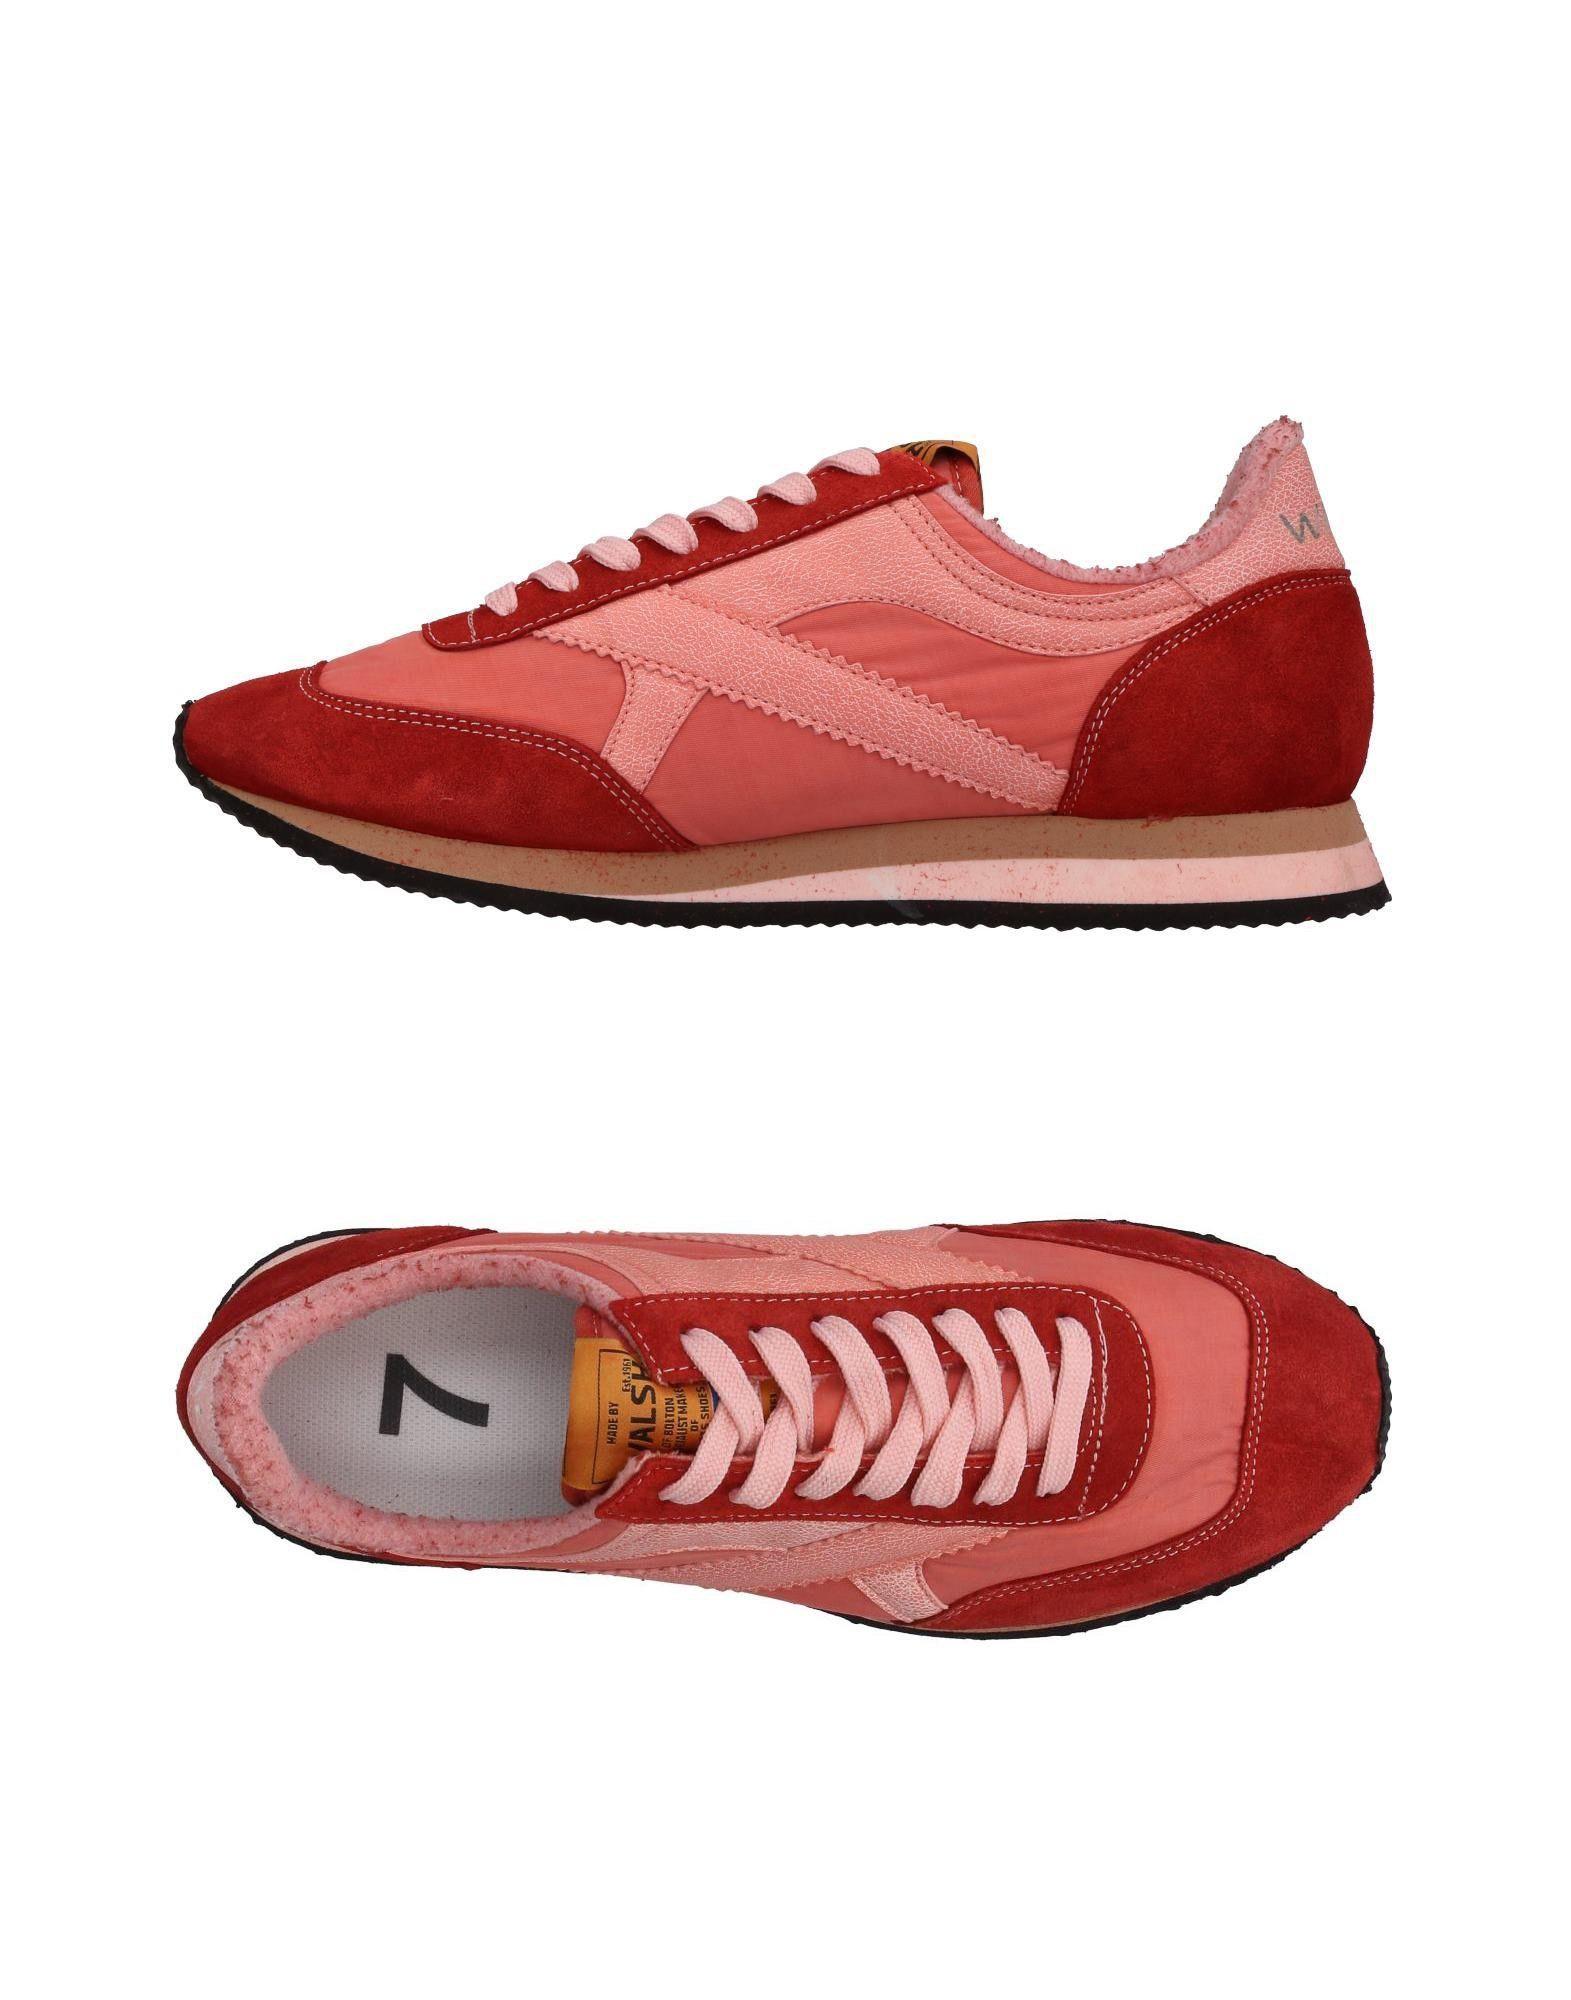 brooks низкие кеды и кроссовки WALSH Низкие кеды и кроссовки